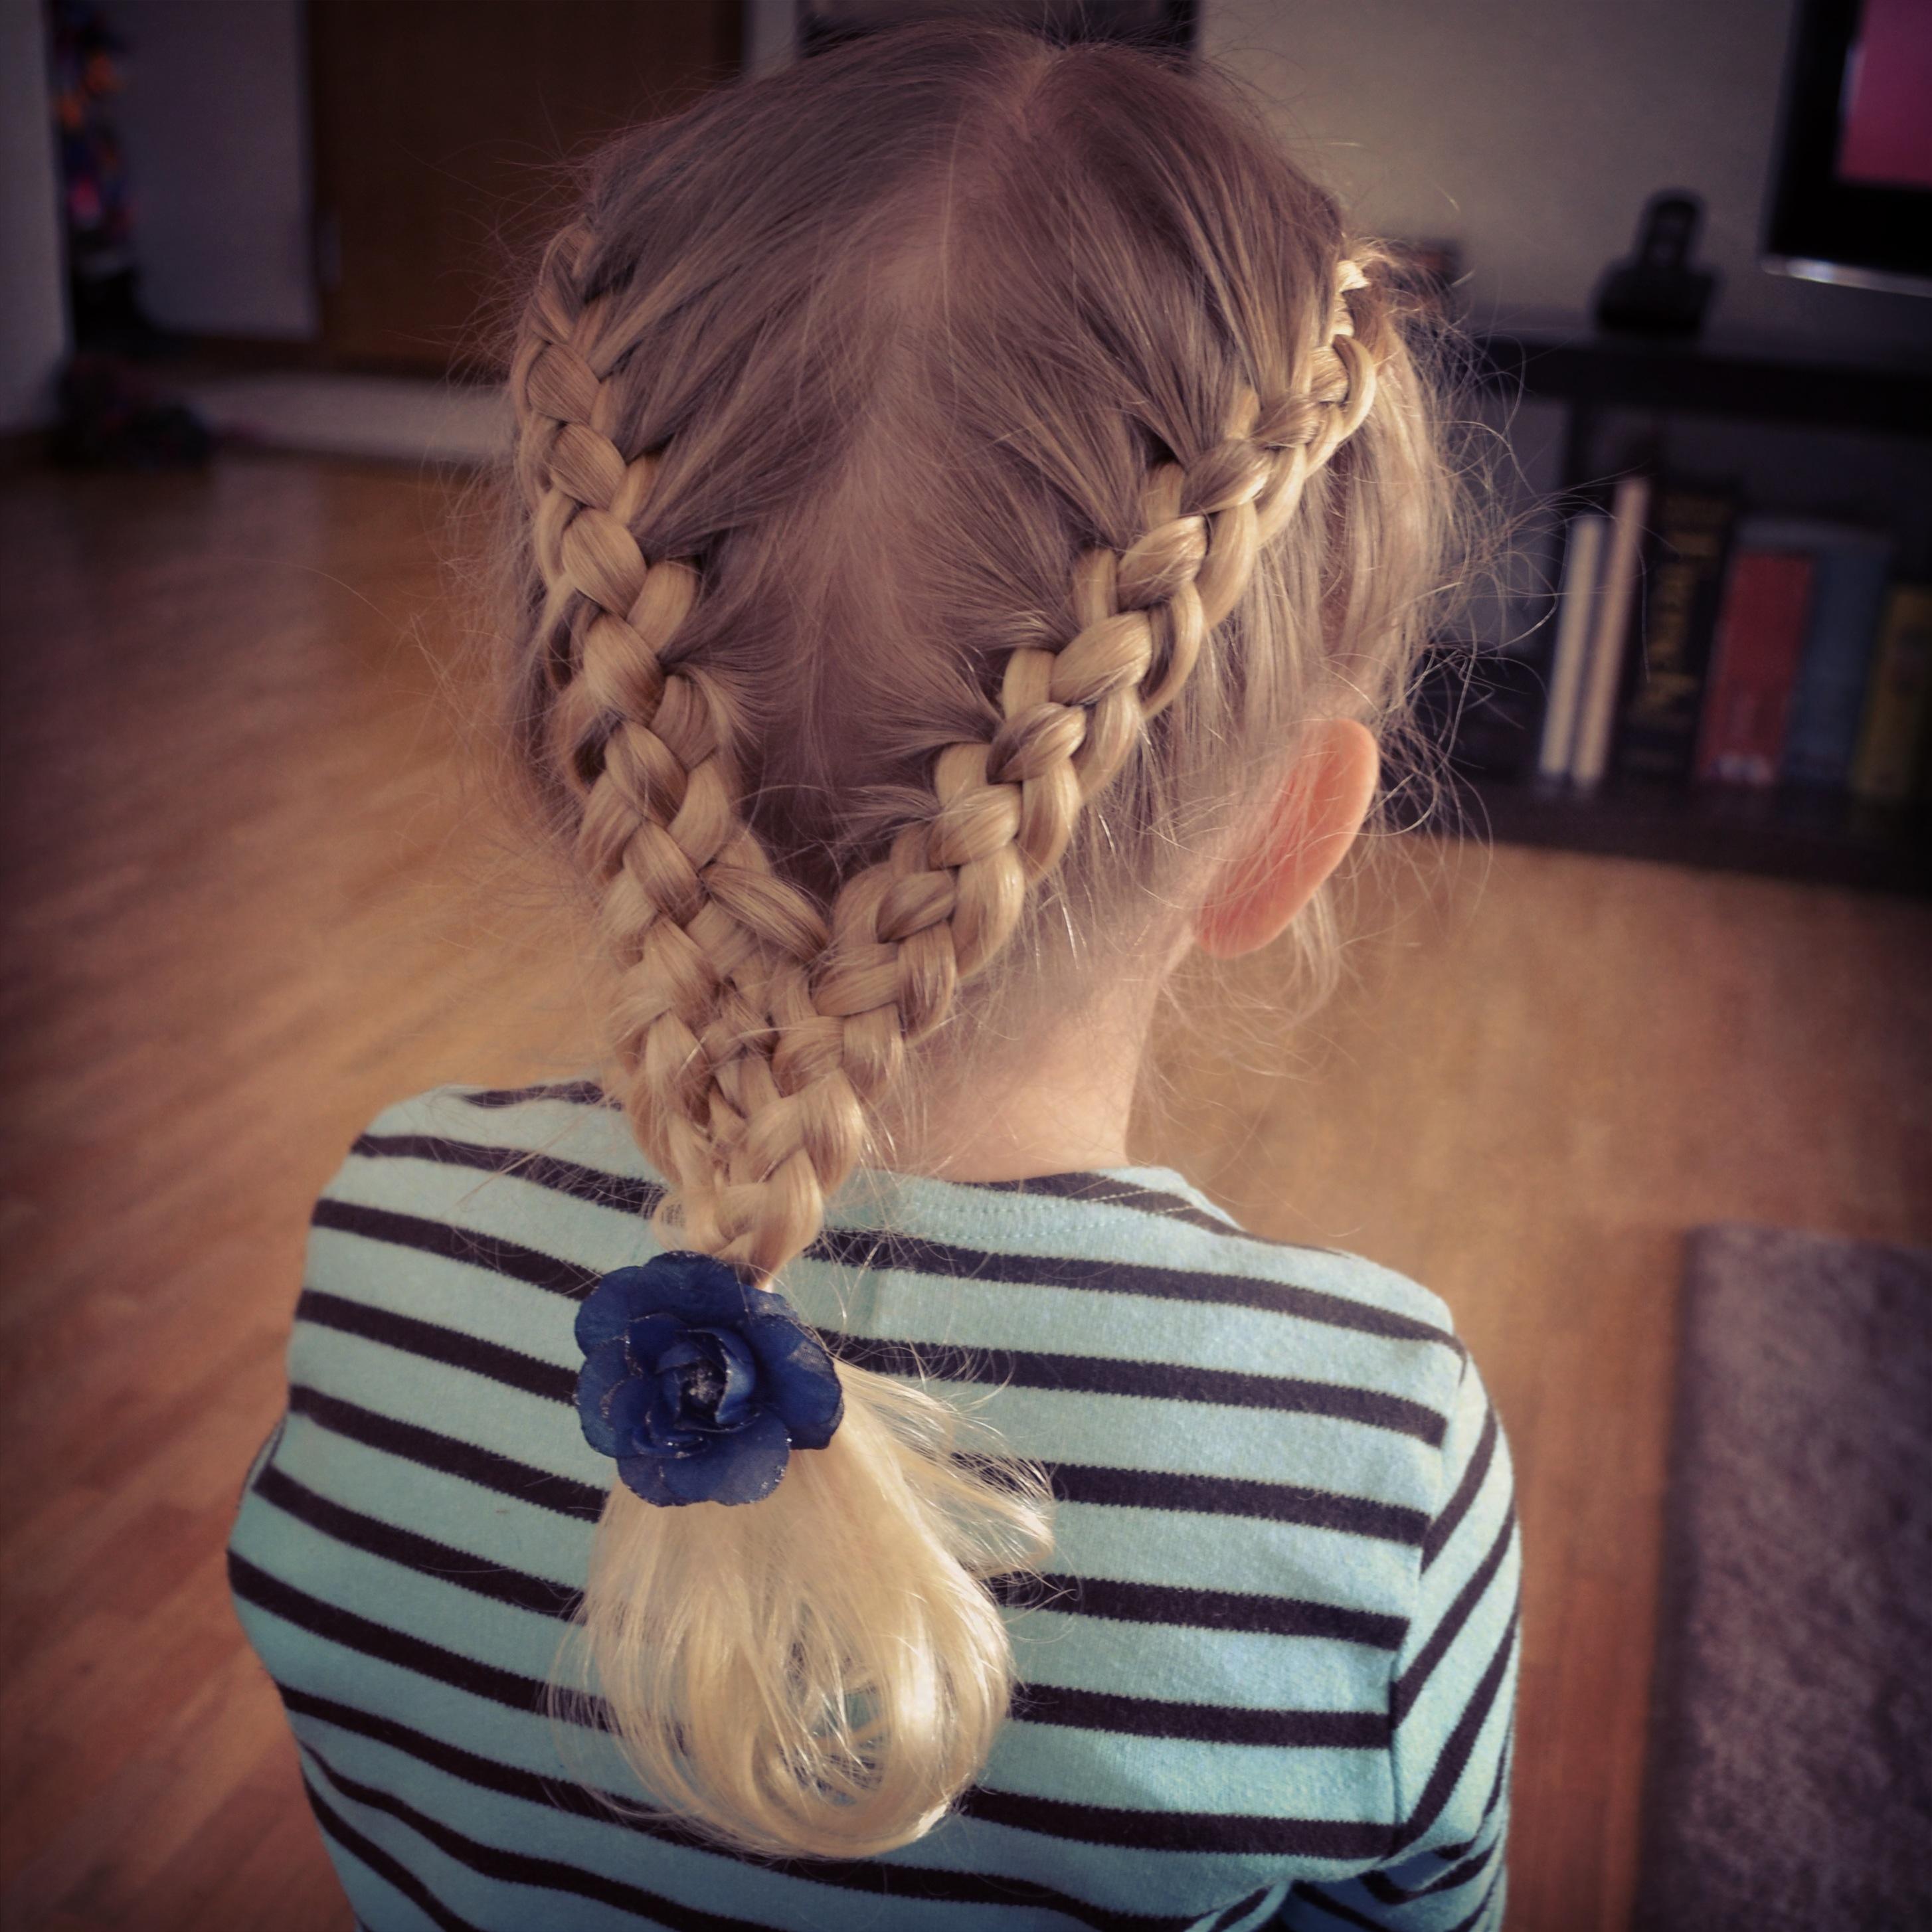 Two french braids into one braid two four strand french braids